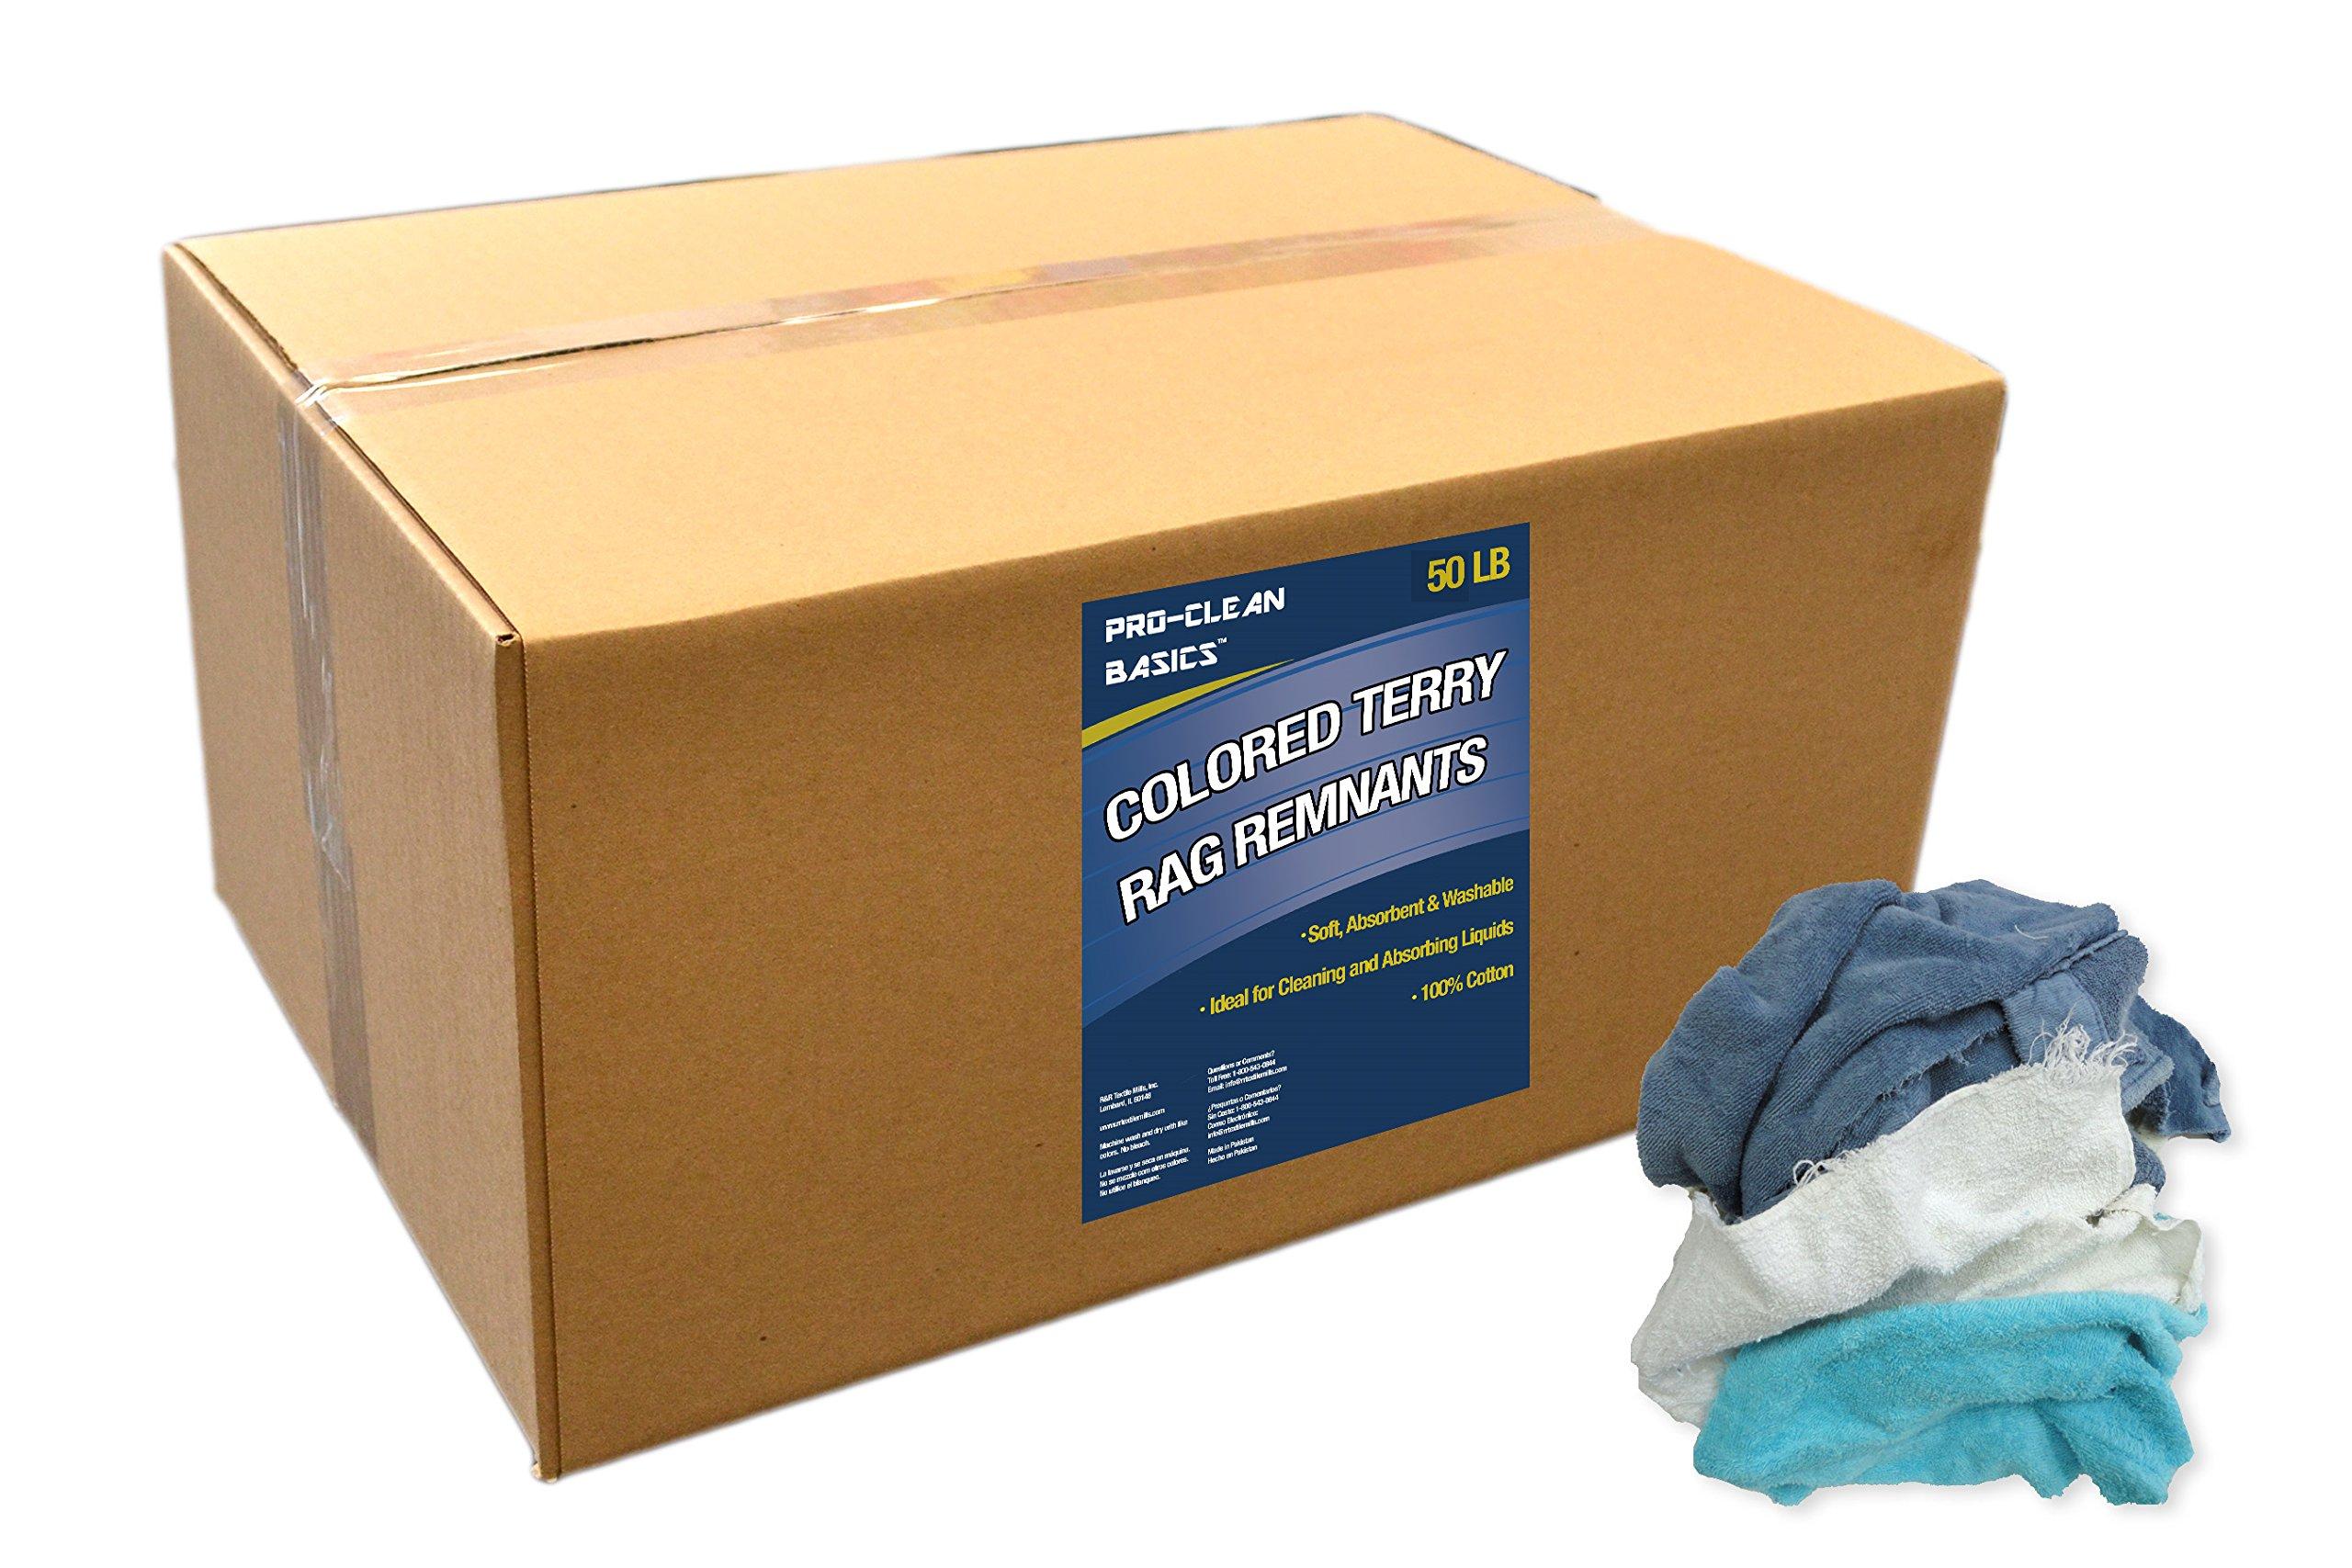 Pro-Clean Basics 99402 Colored Terry Cloth Remnants, 50 lb. Box